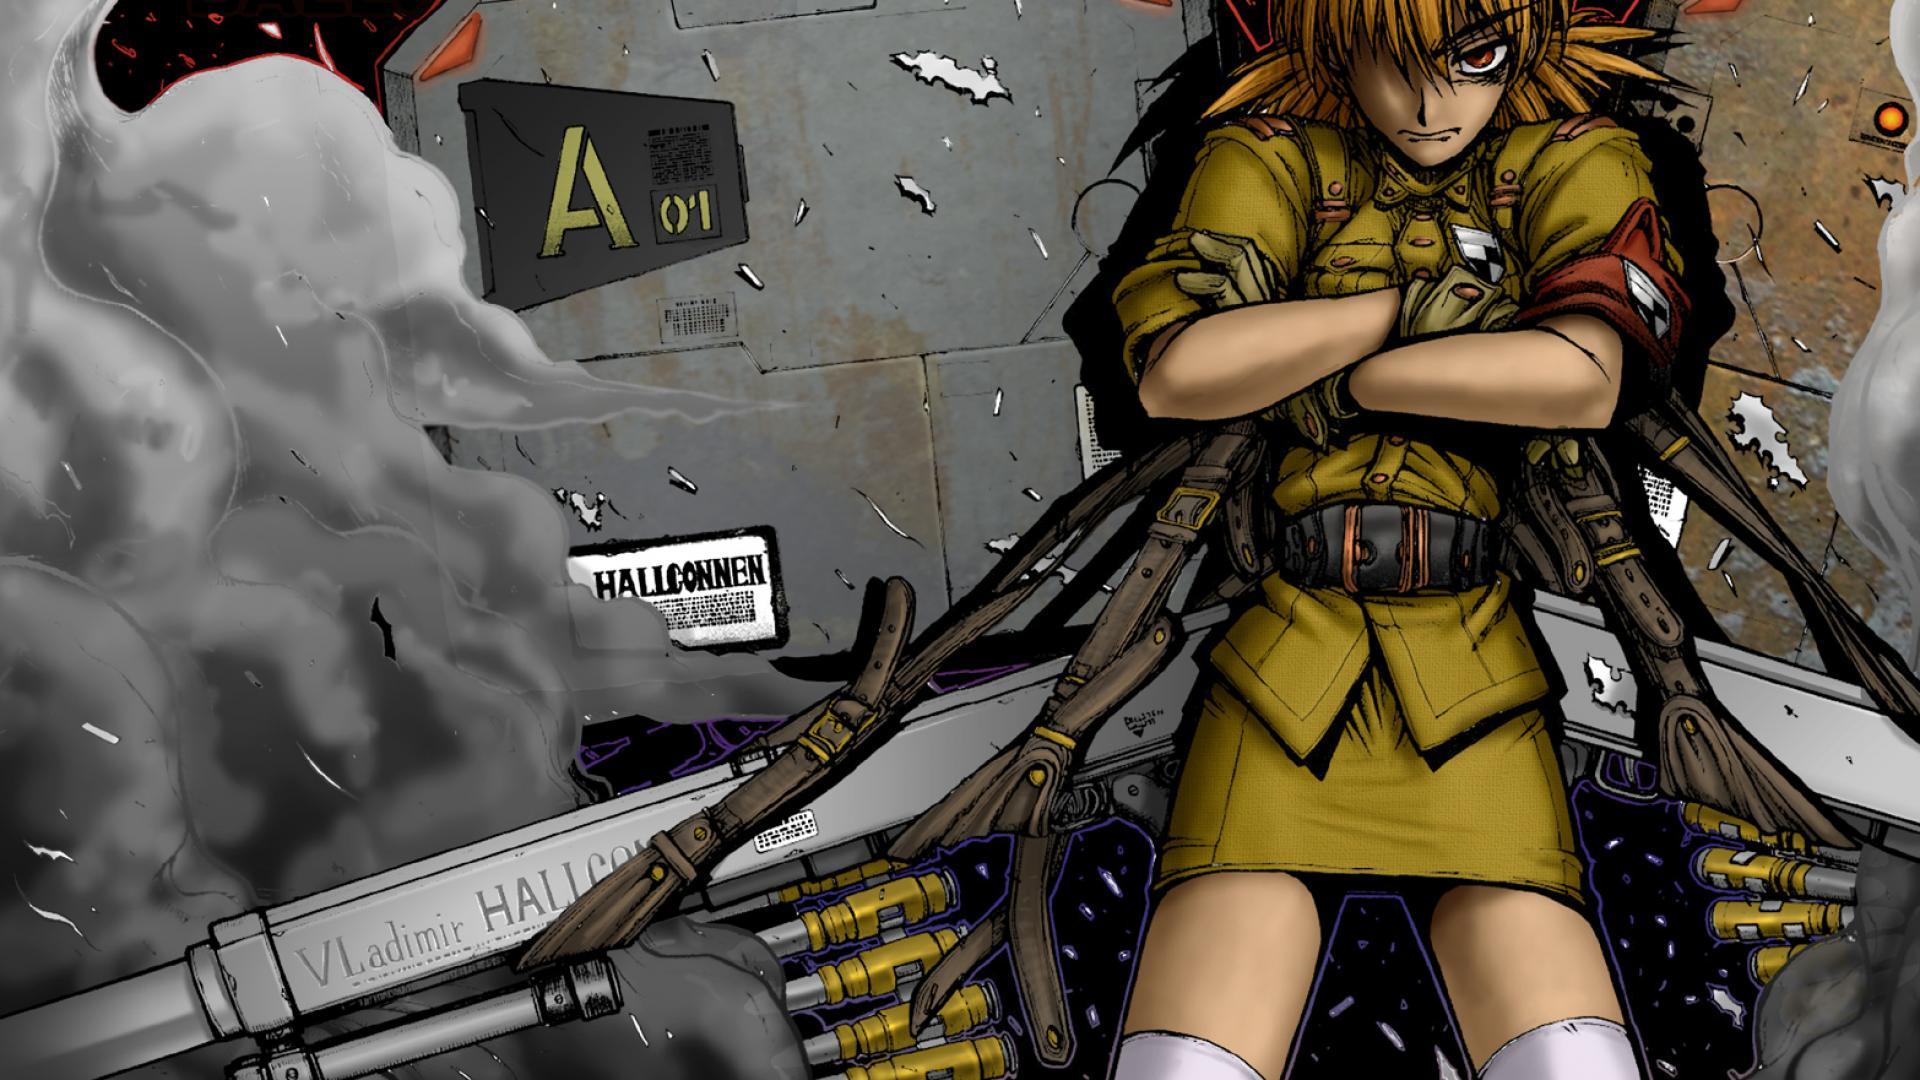 Badass army wallpapers wallpapersafari - Badass backgrounds ...